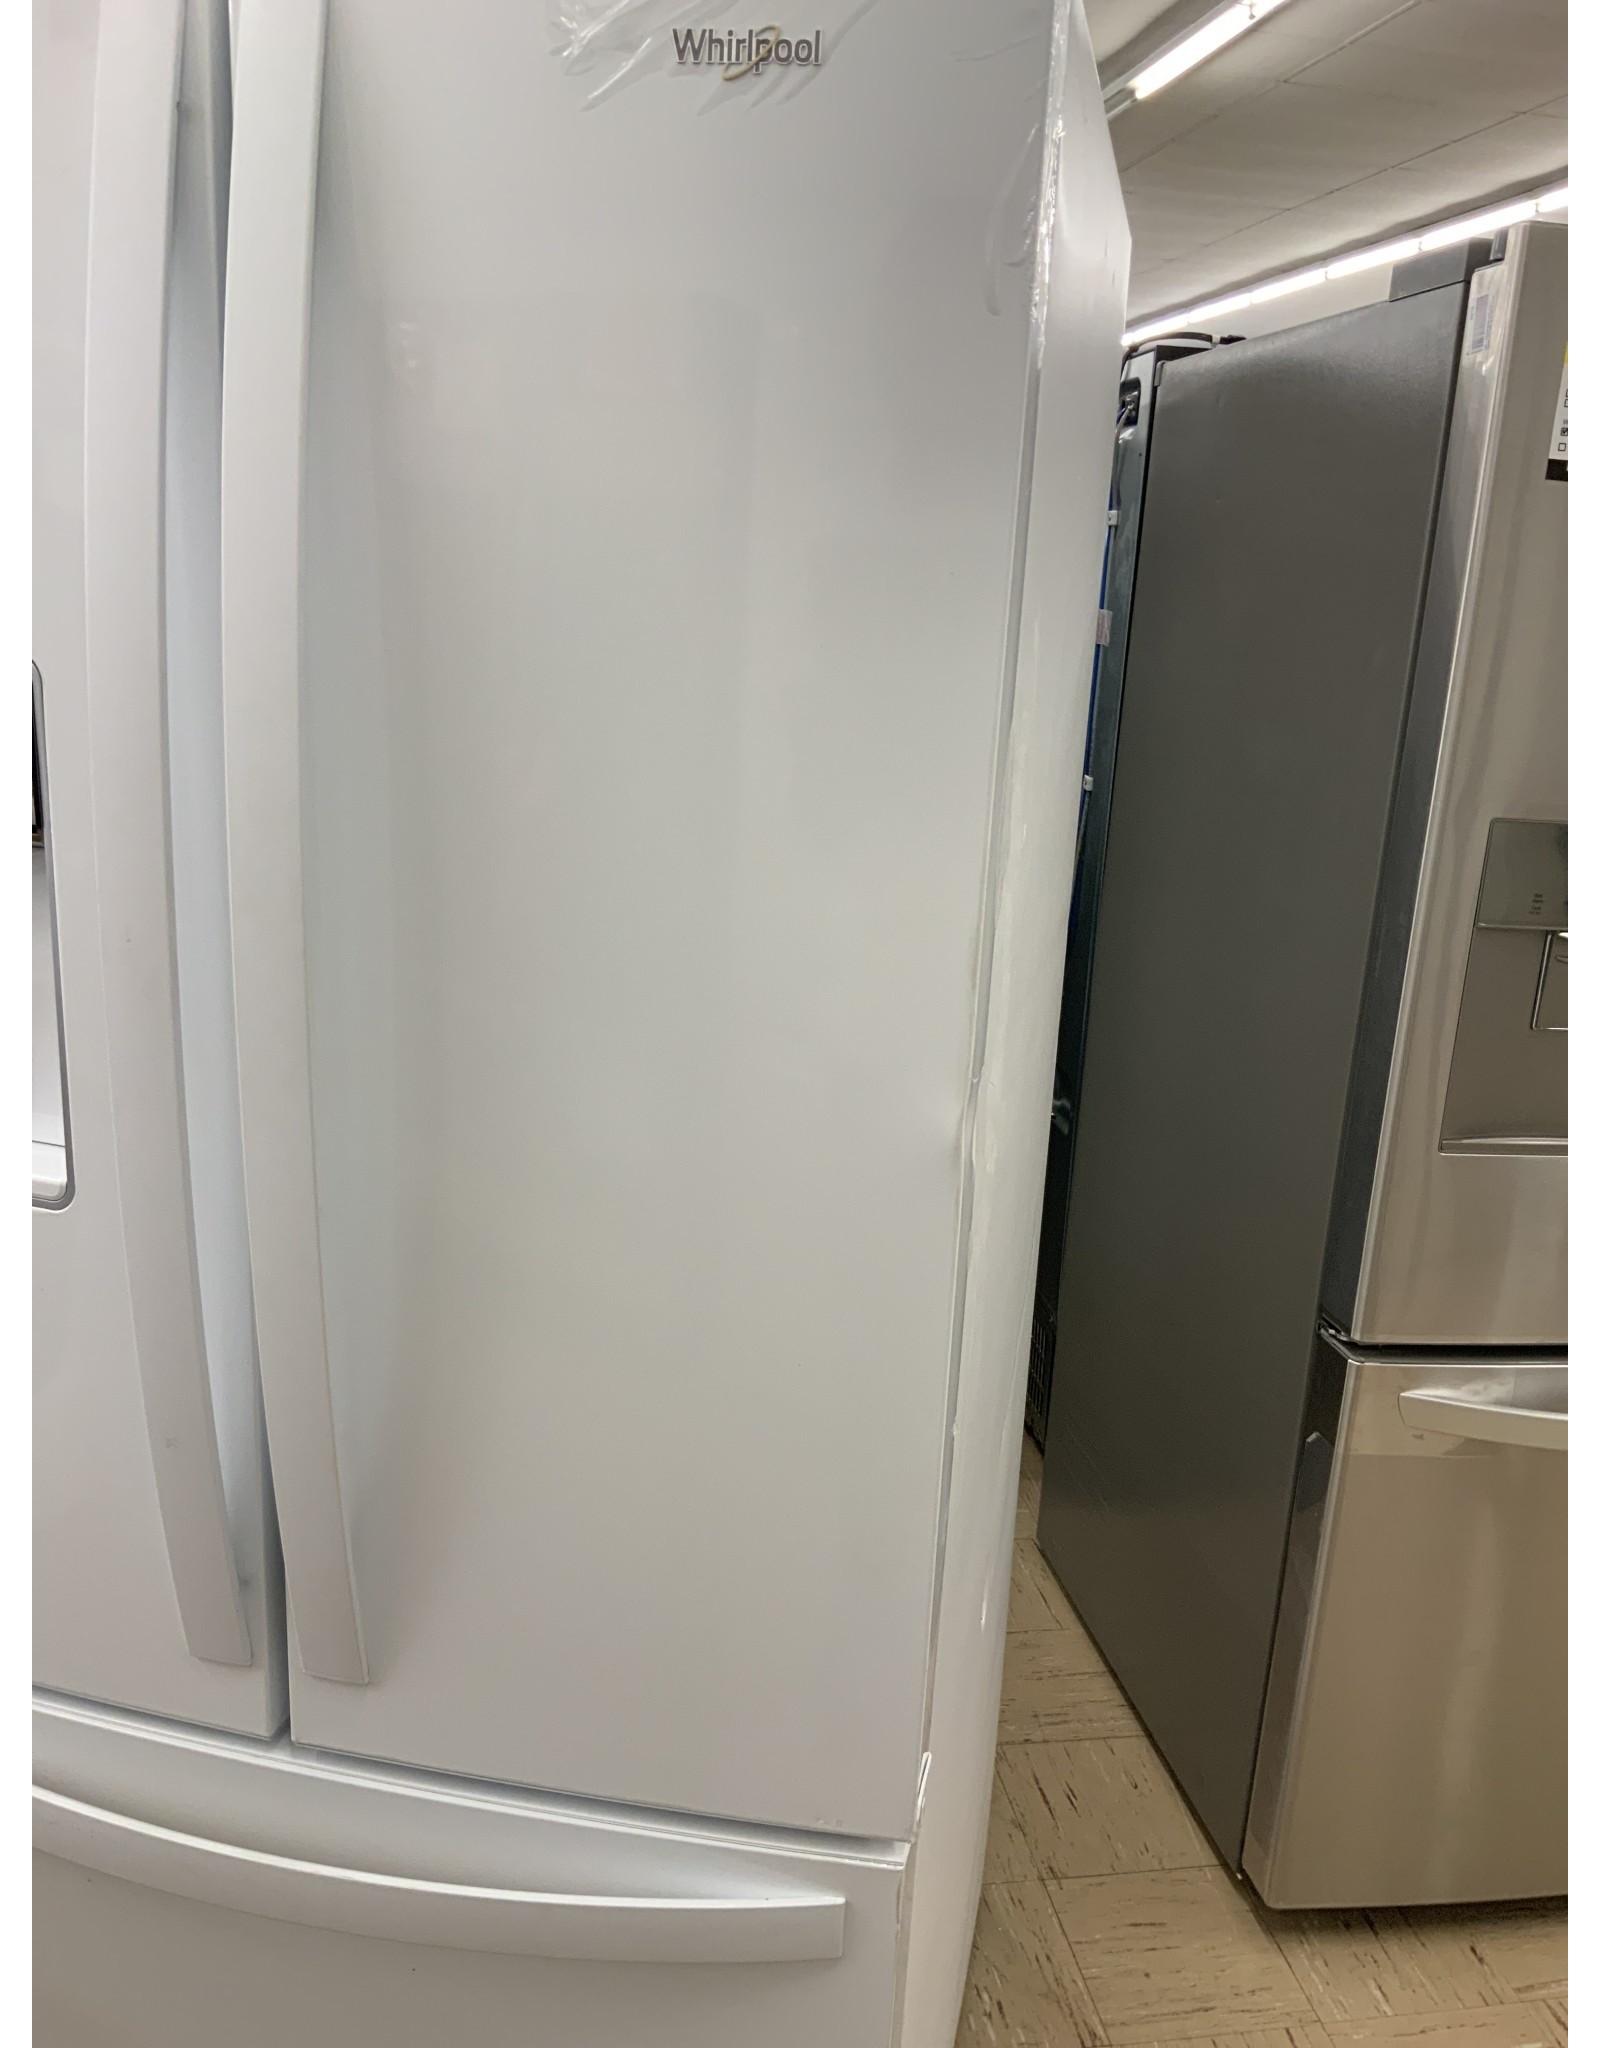 "WRF560SEHW WHR No Frost Multi Dr -FreeStandg Refr Frez - 20 CU FT, 30"" WIDTH, ESTAR, FRENCH DOOR,"